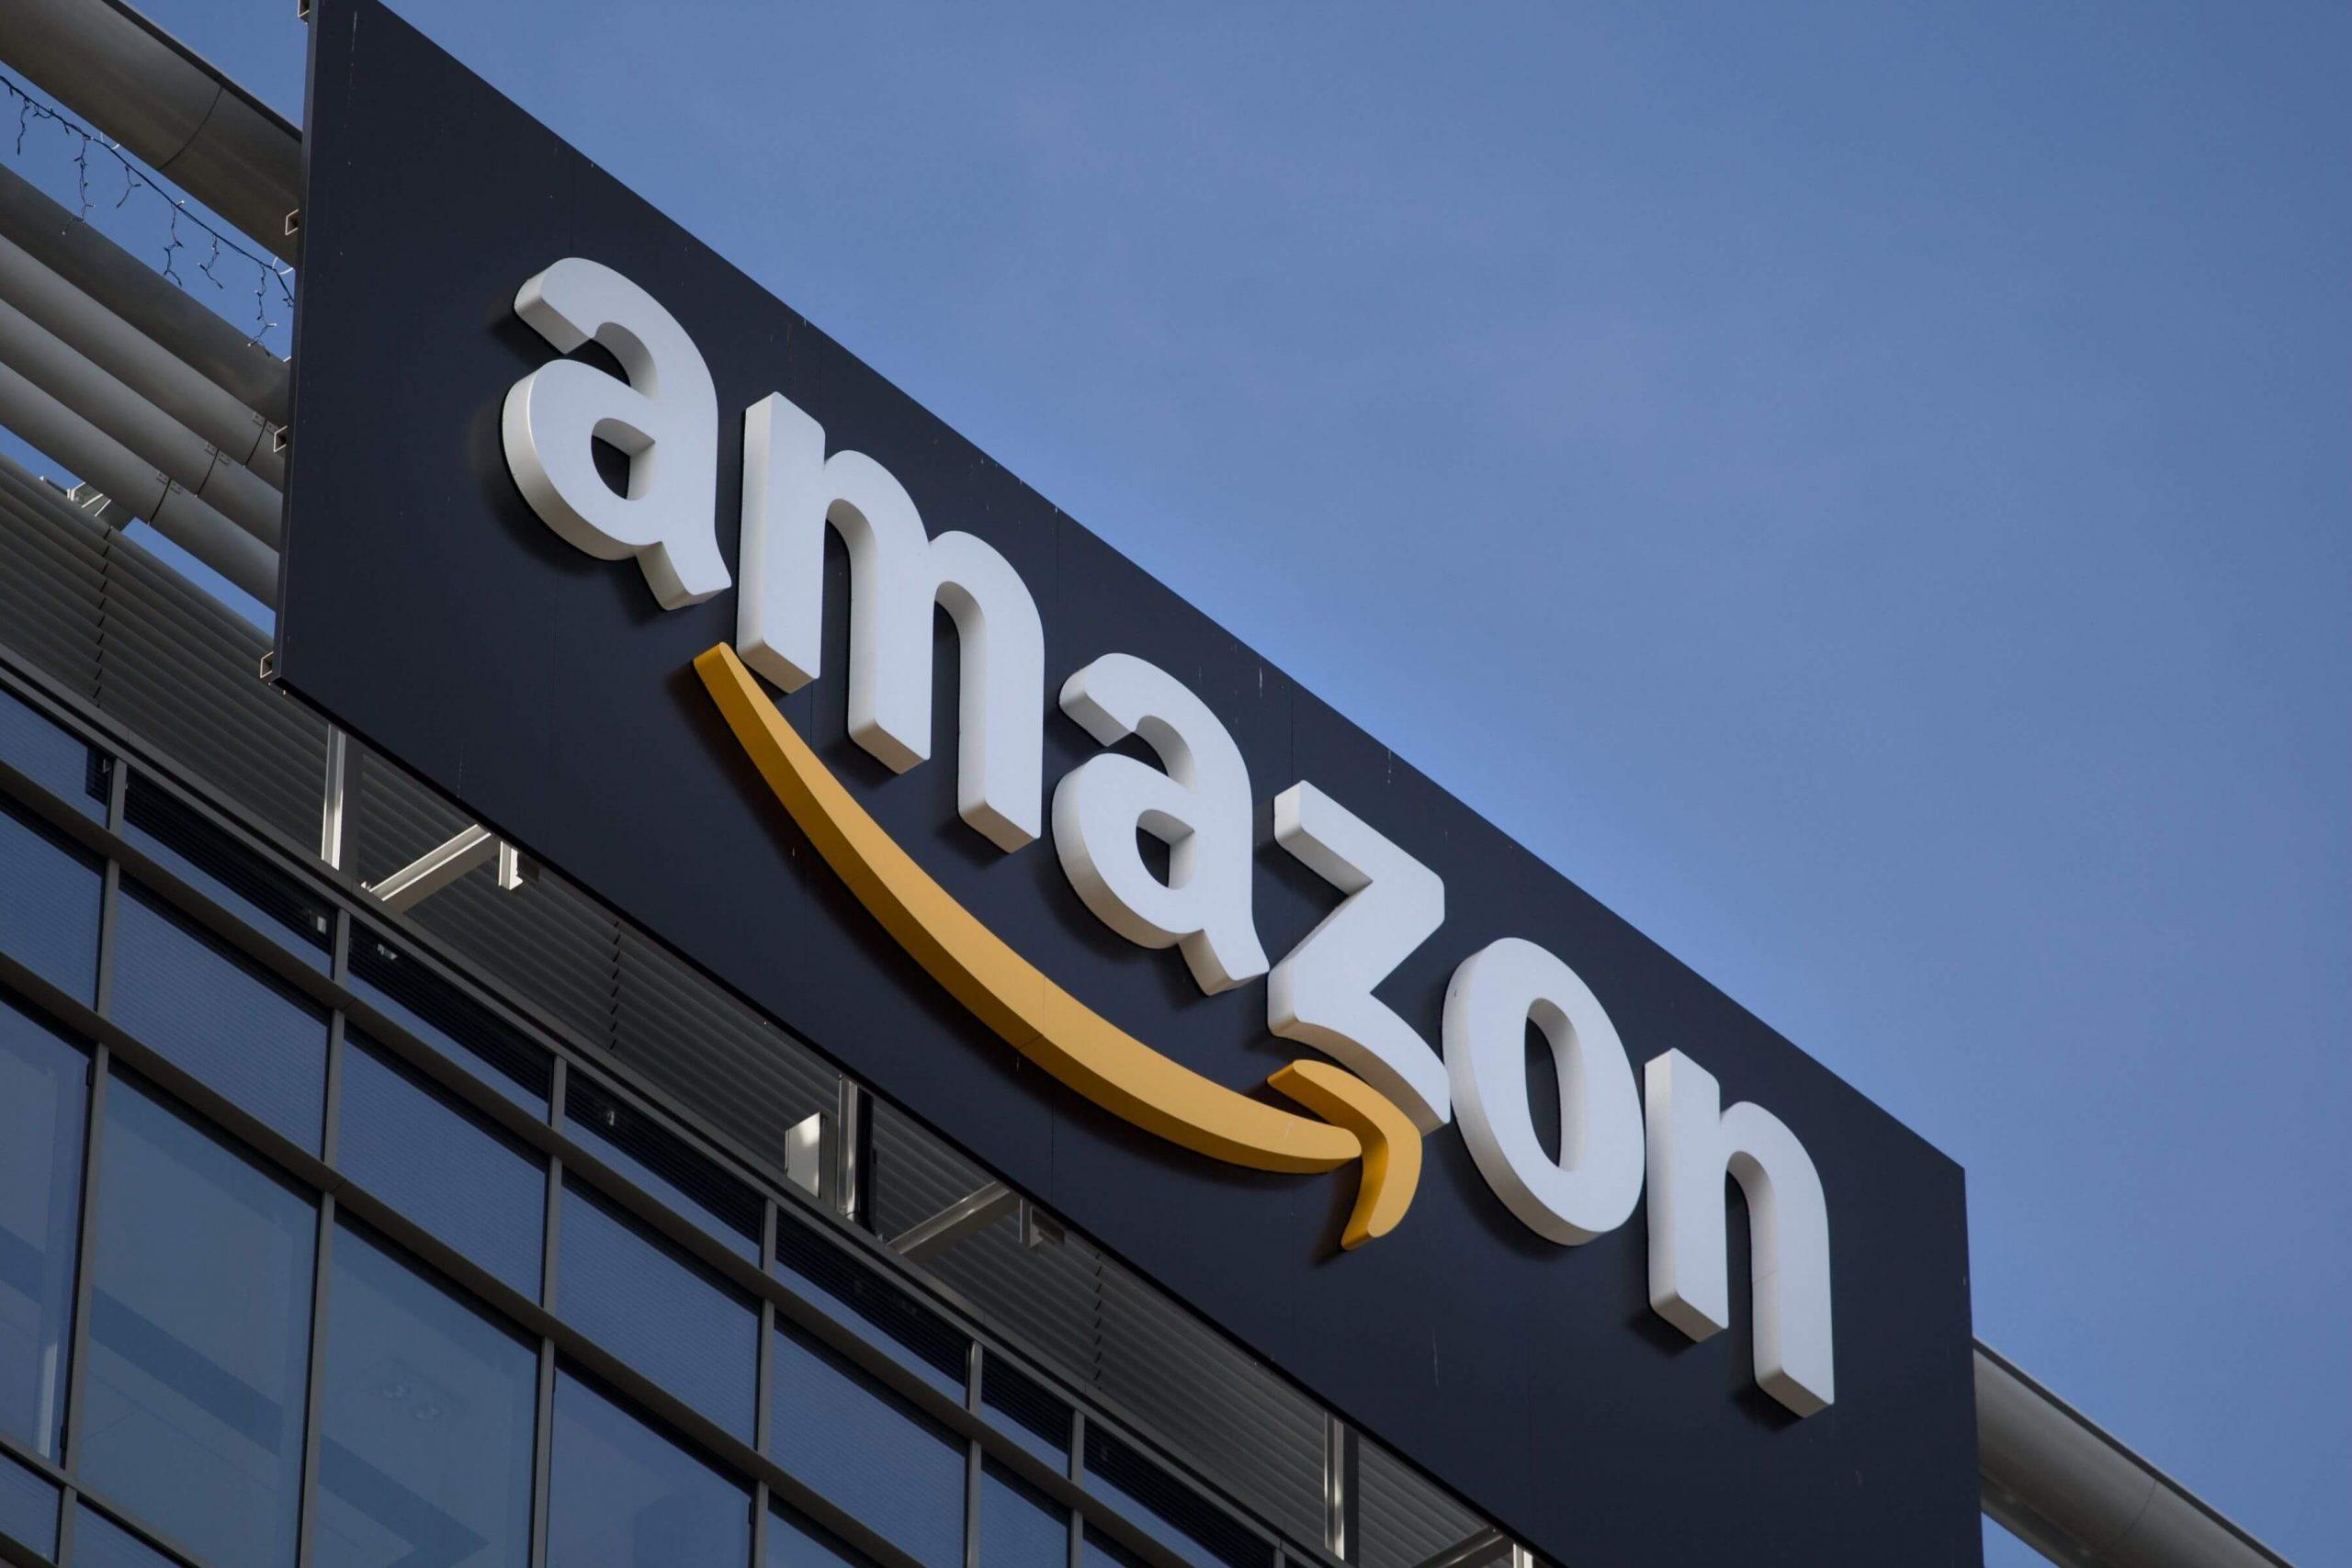 Amazon se prepara para estrear no Brasil com sua plataforma de publicidade